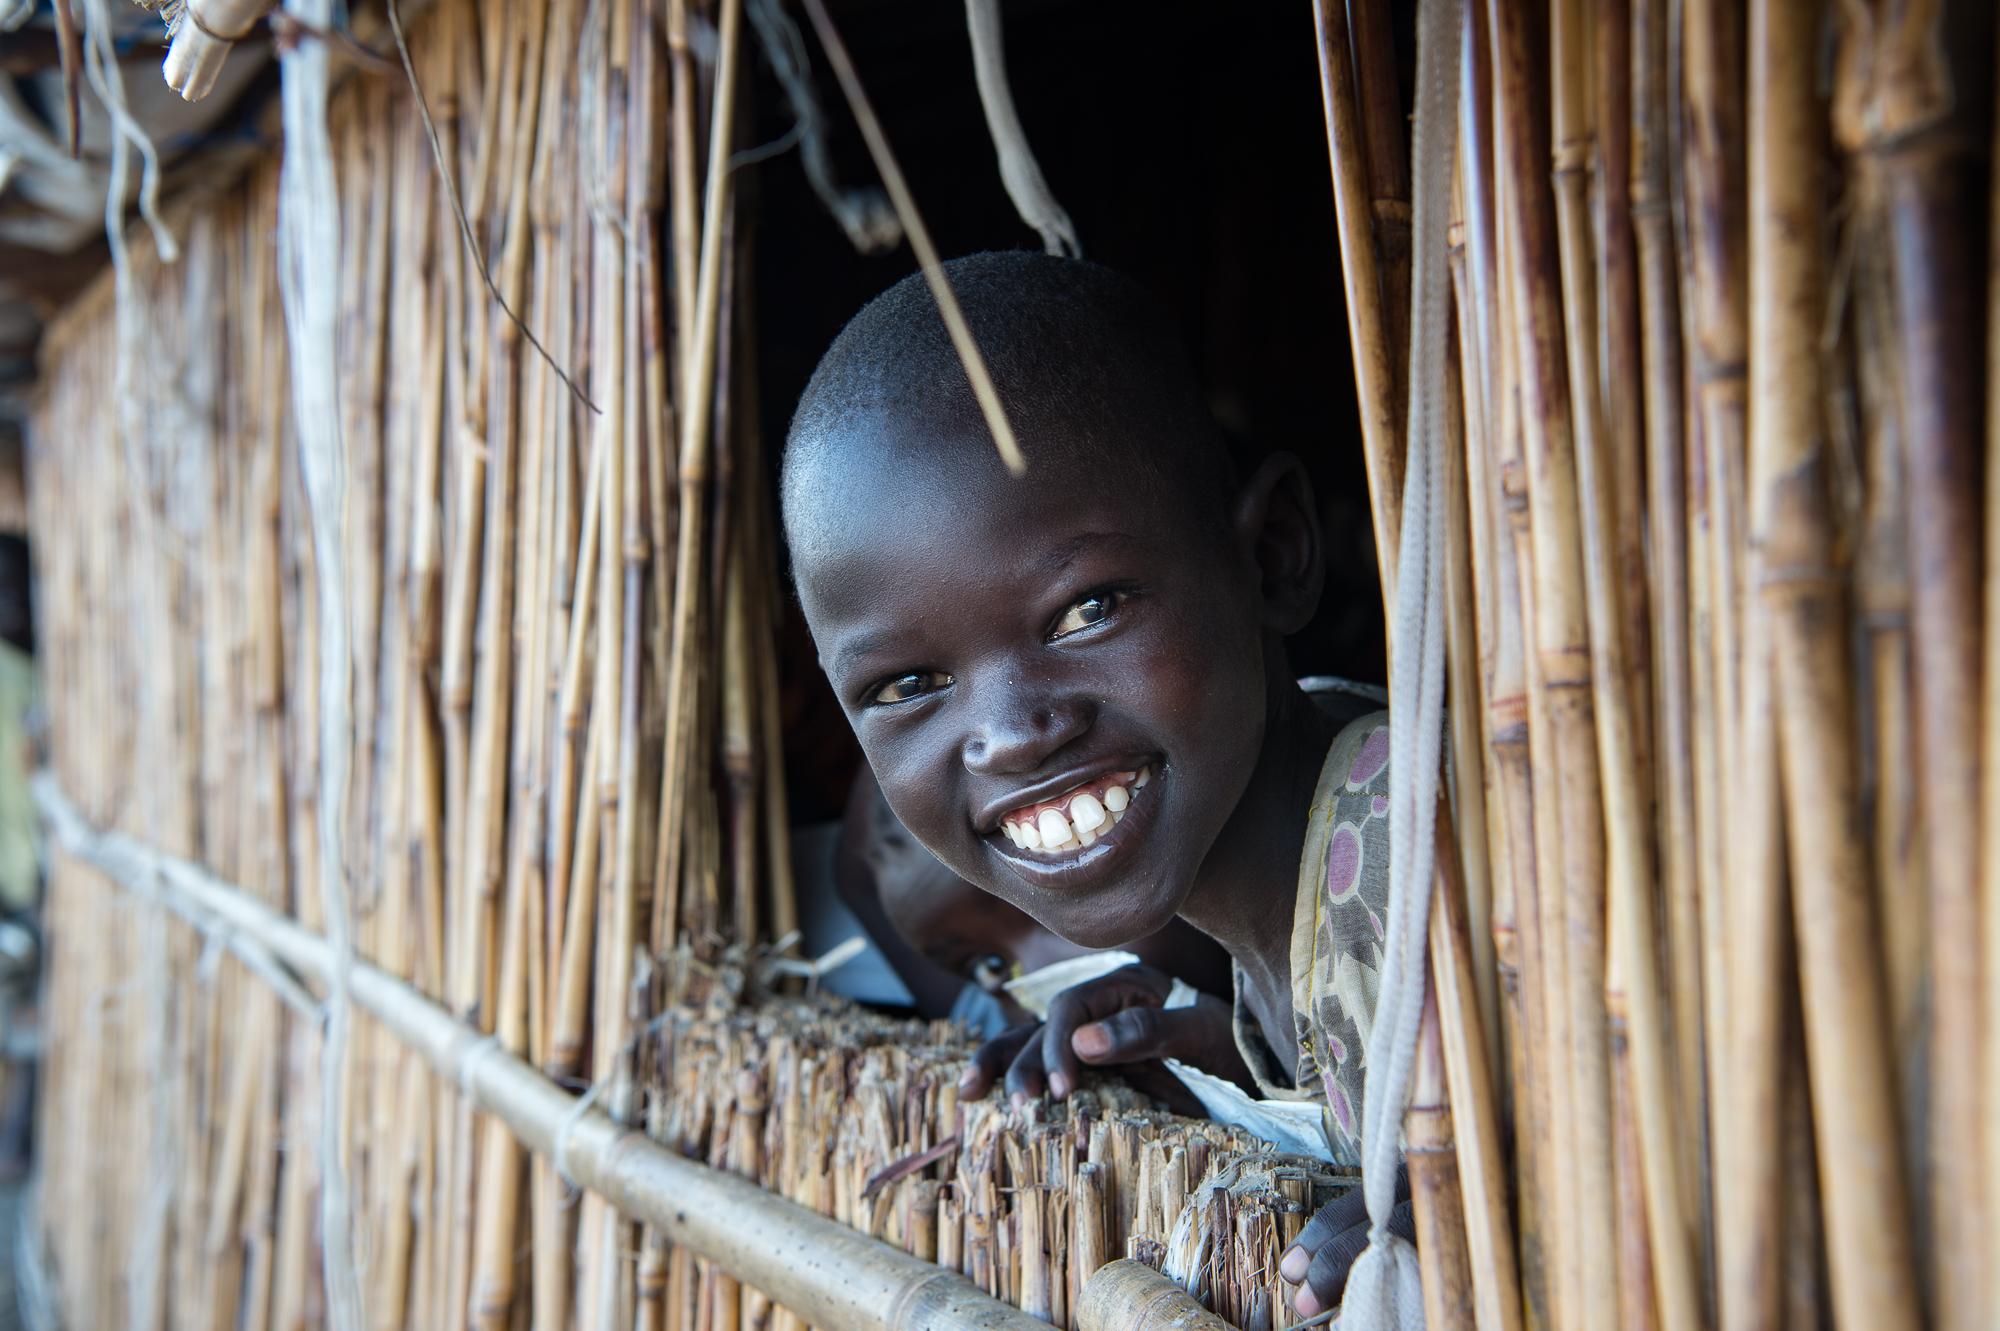 AE_SS16_UNICEF__4742.jpg